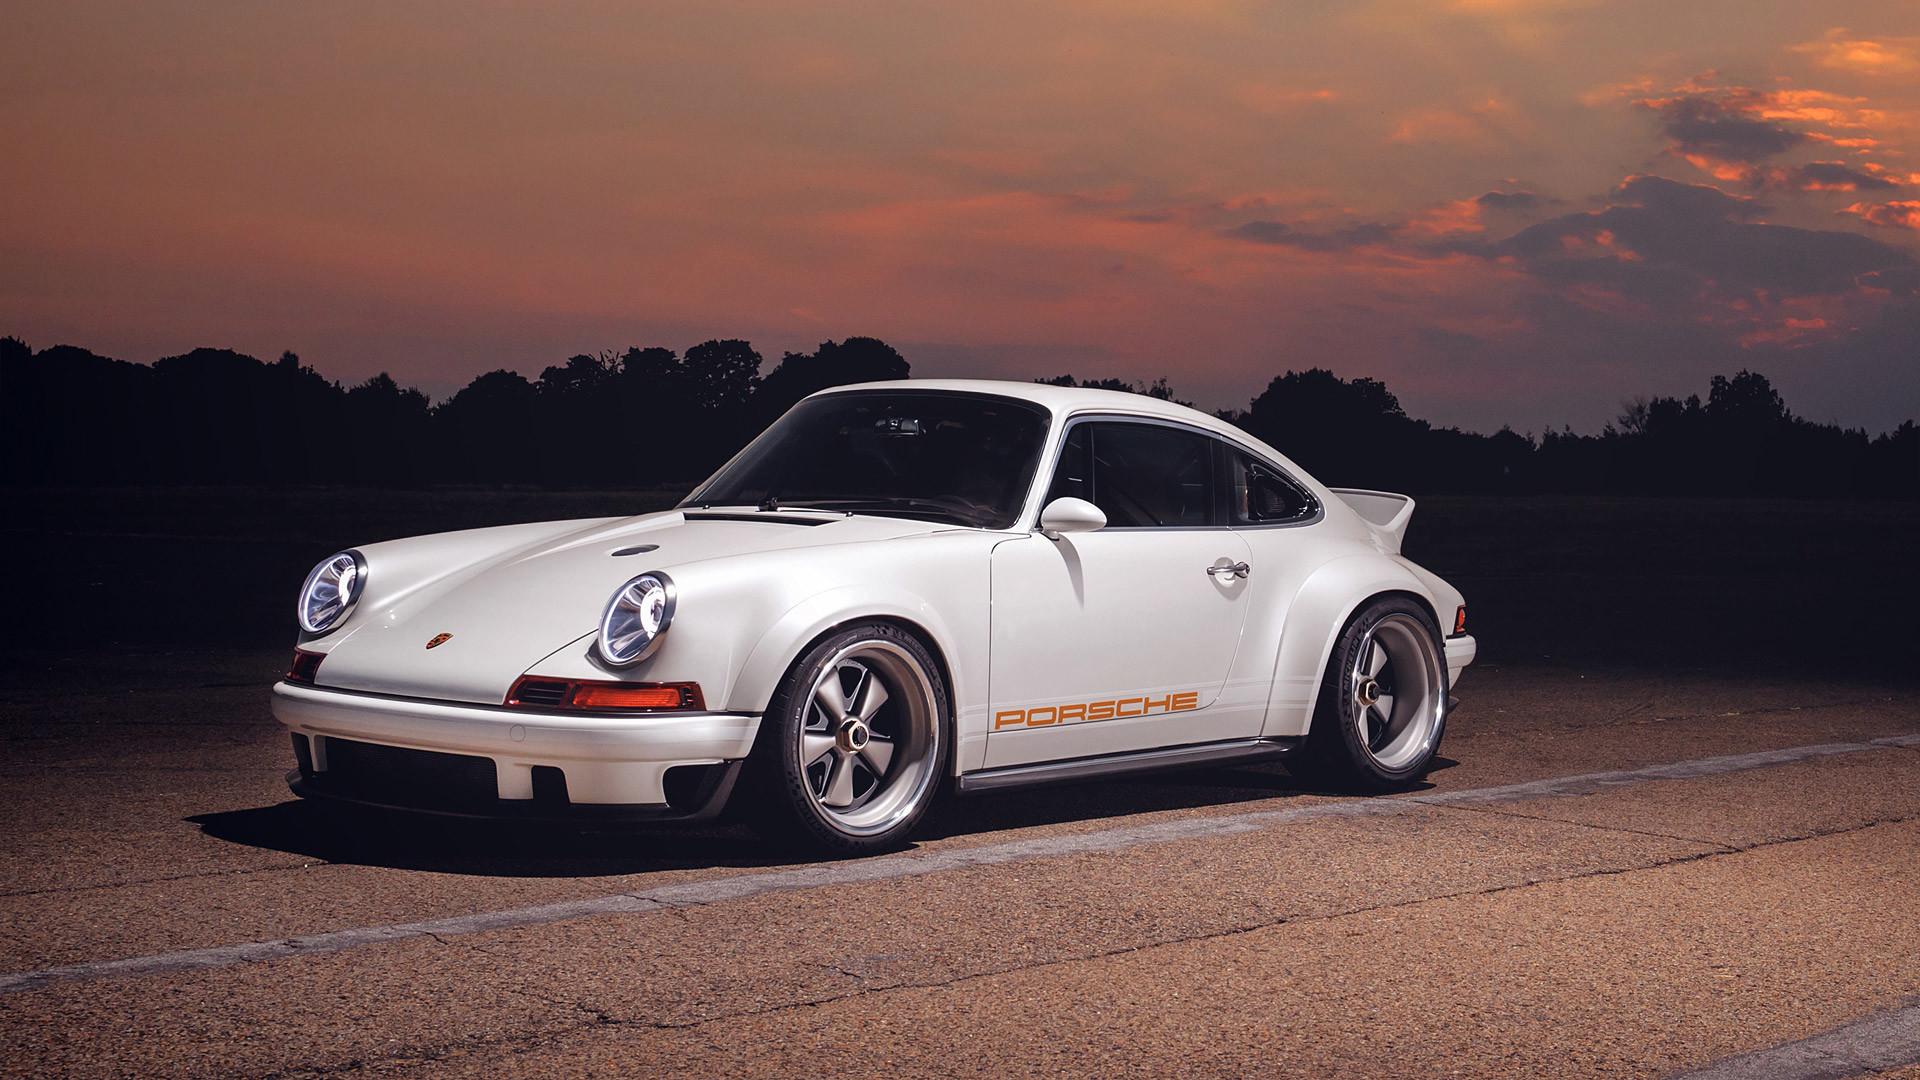 Singer Porsche Wallpaper (70+ images)